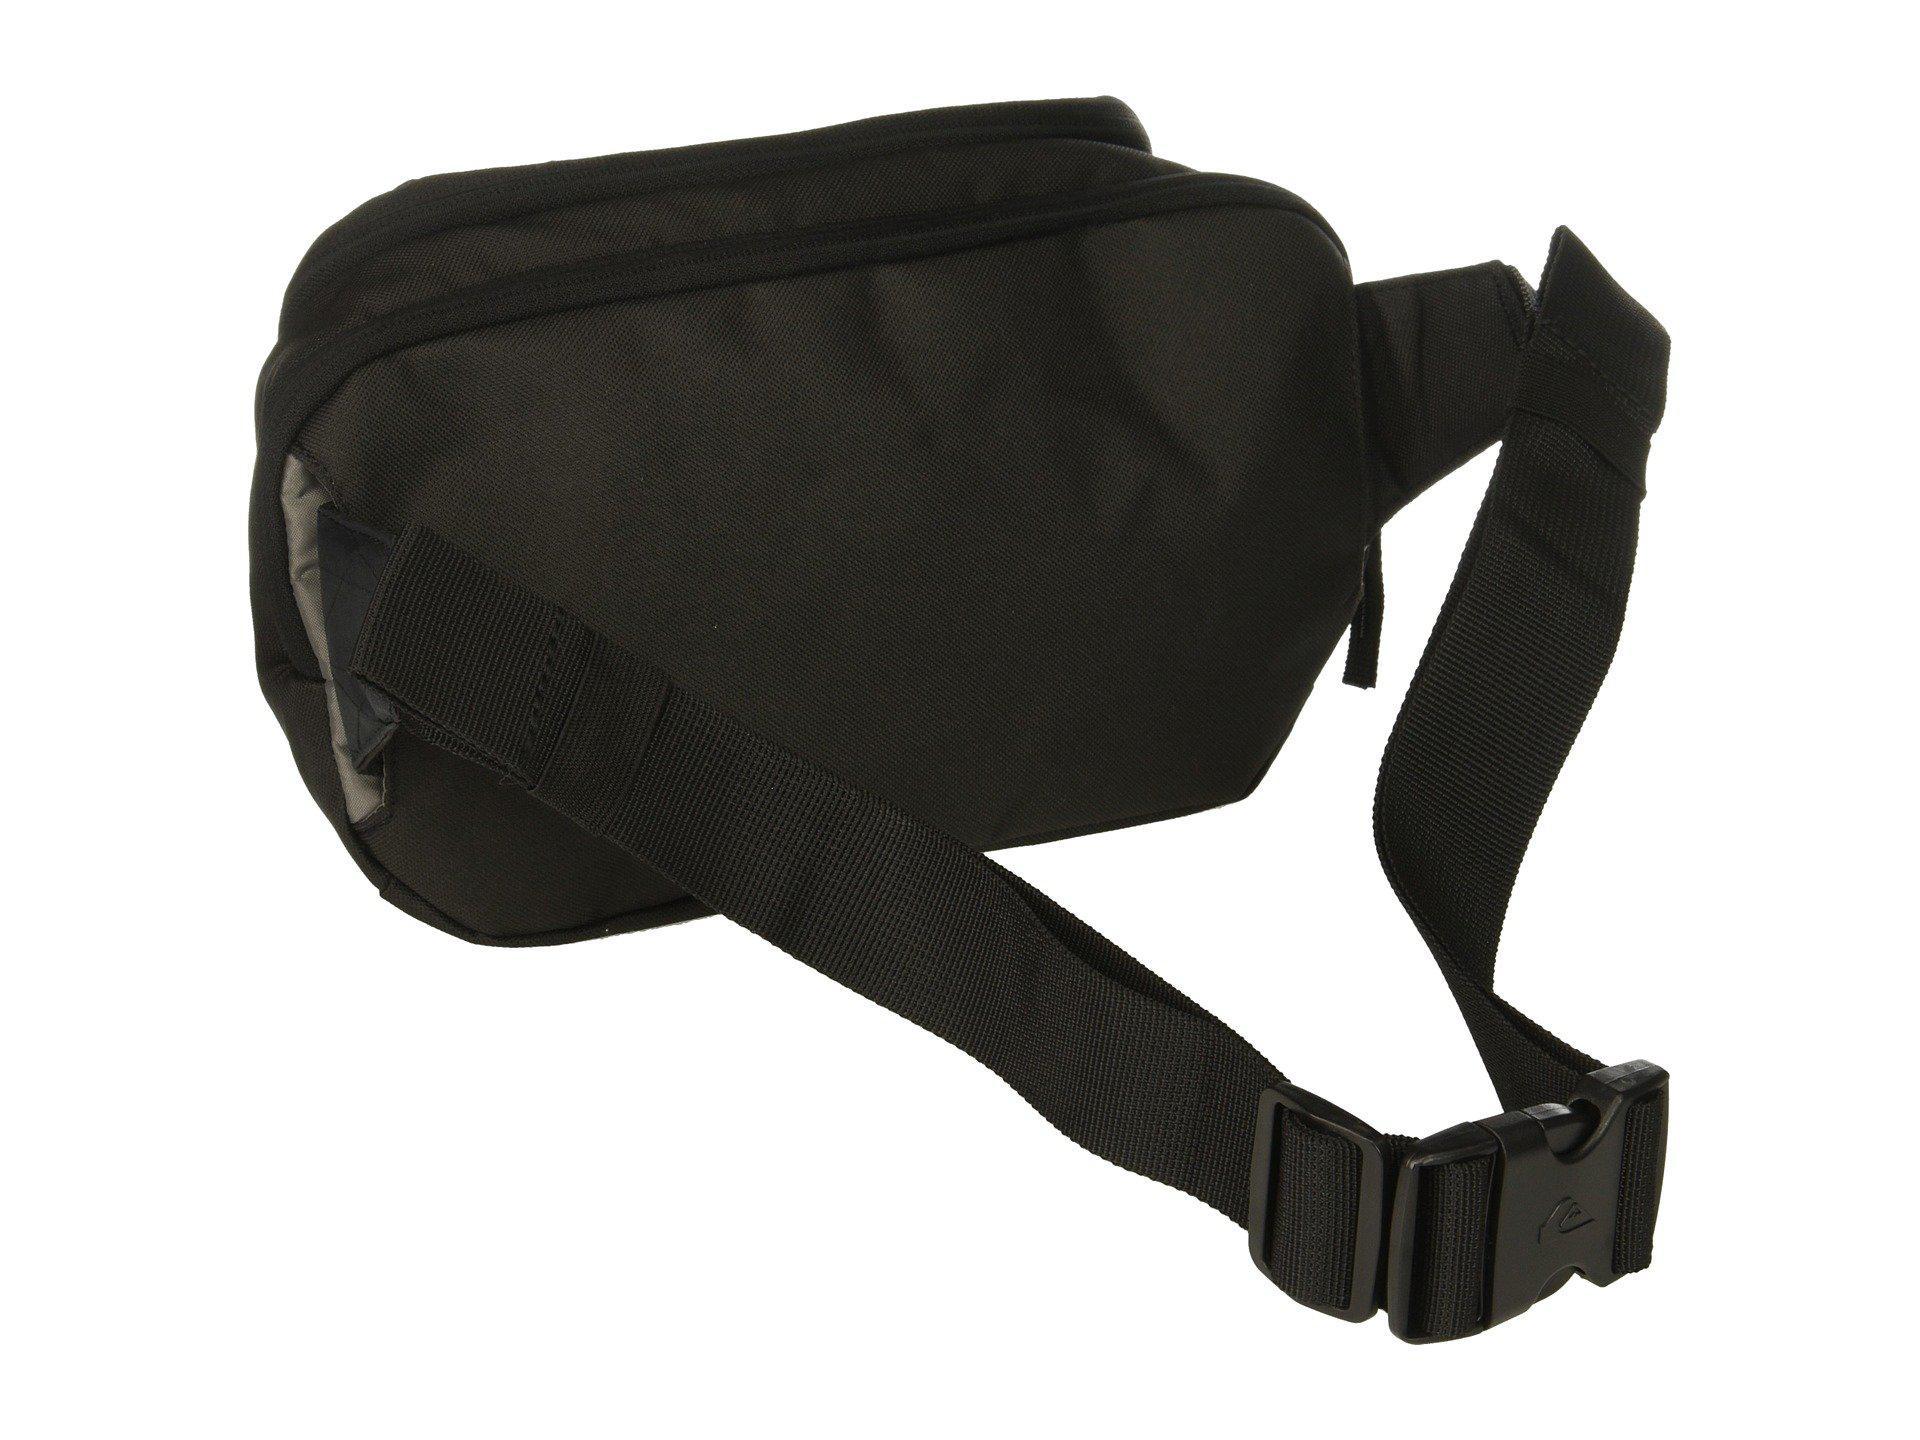 595b0326eafbd Quiksilver - Lone Walker Ii Waist Bag (black) Travel Pouch for Men - Lyst.  View fullscreen